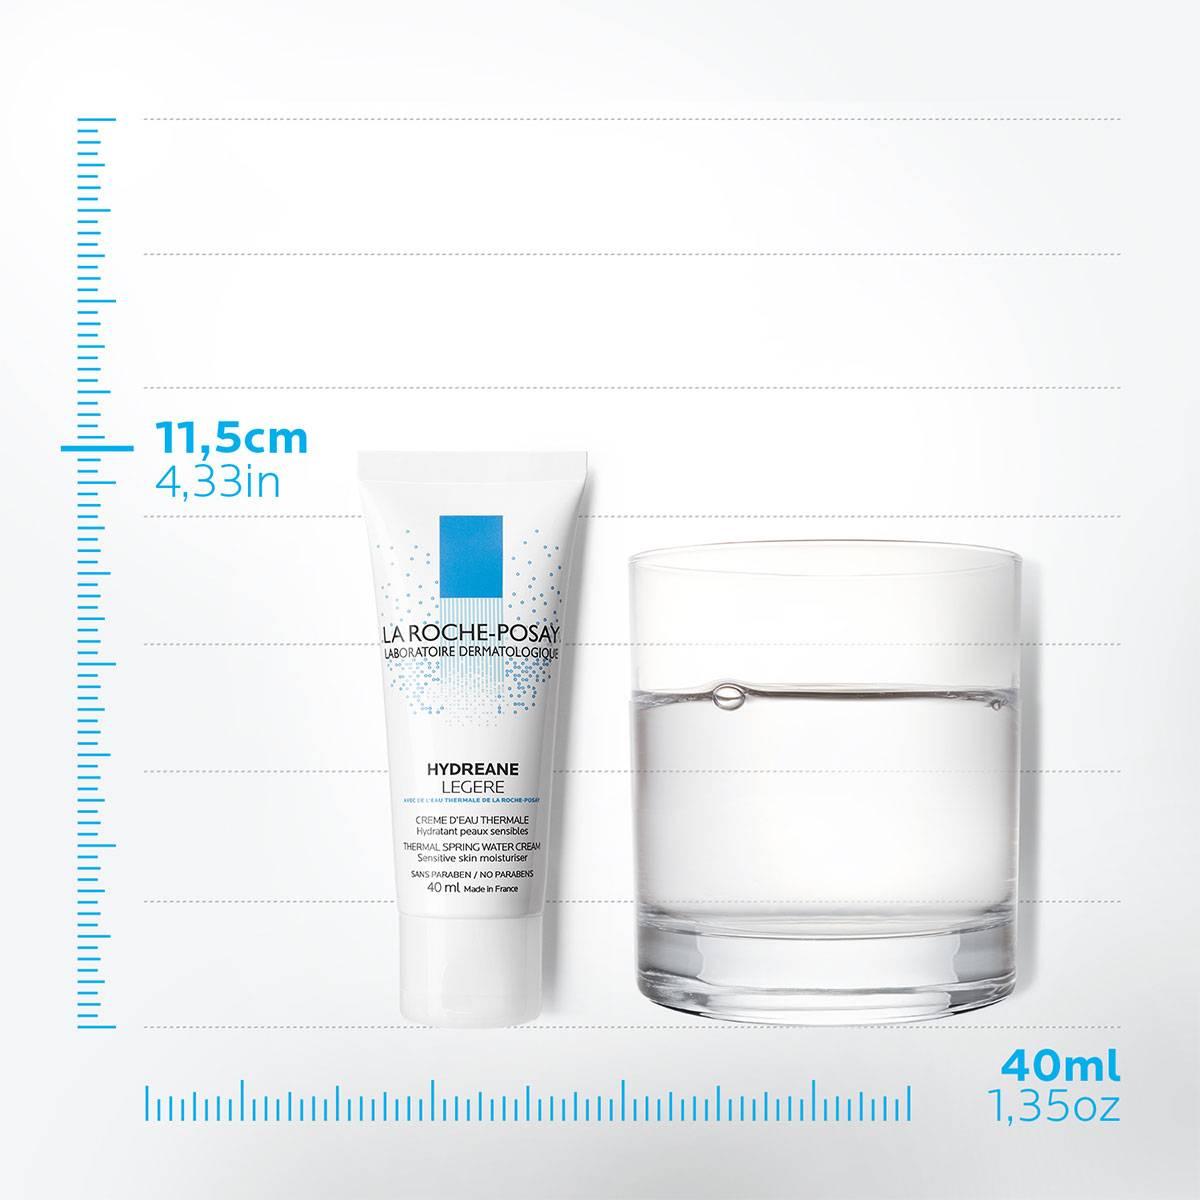 La Roche Posay ProductPage Hydreane Light 40ml 3337872410765